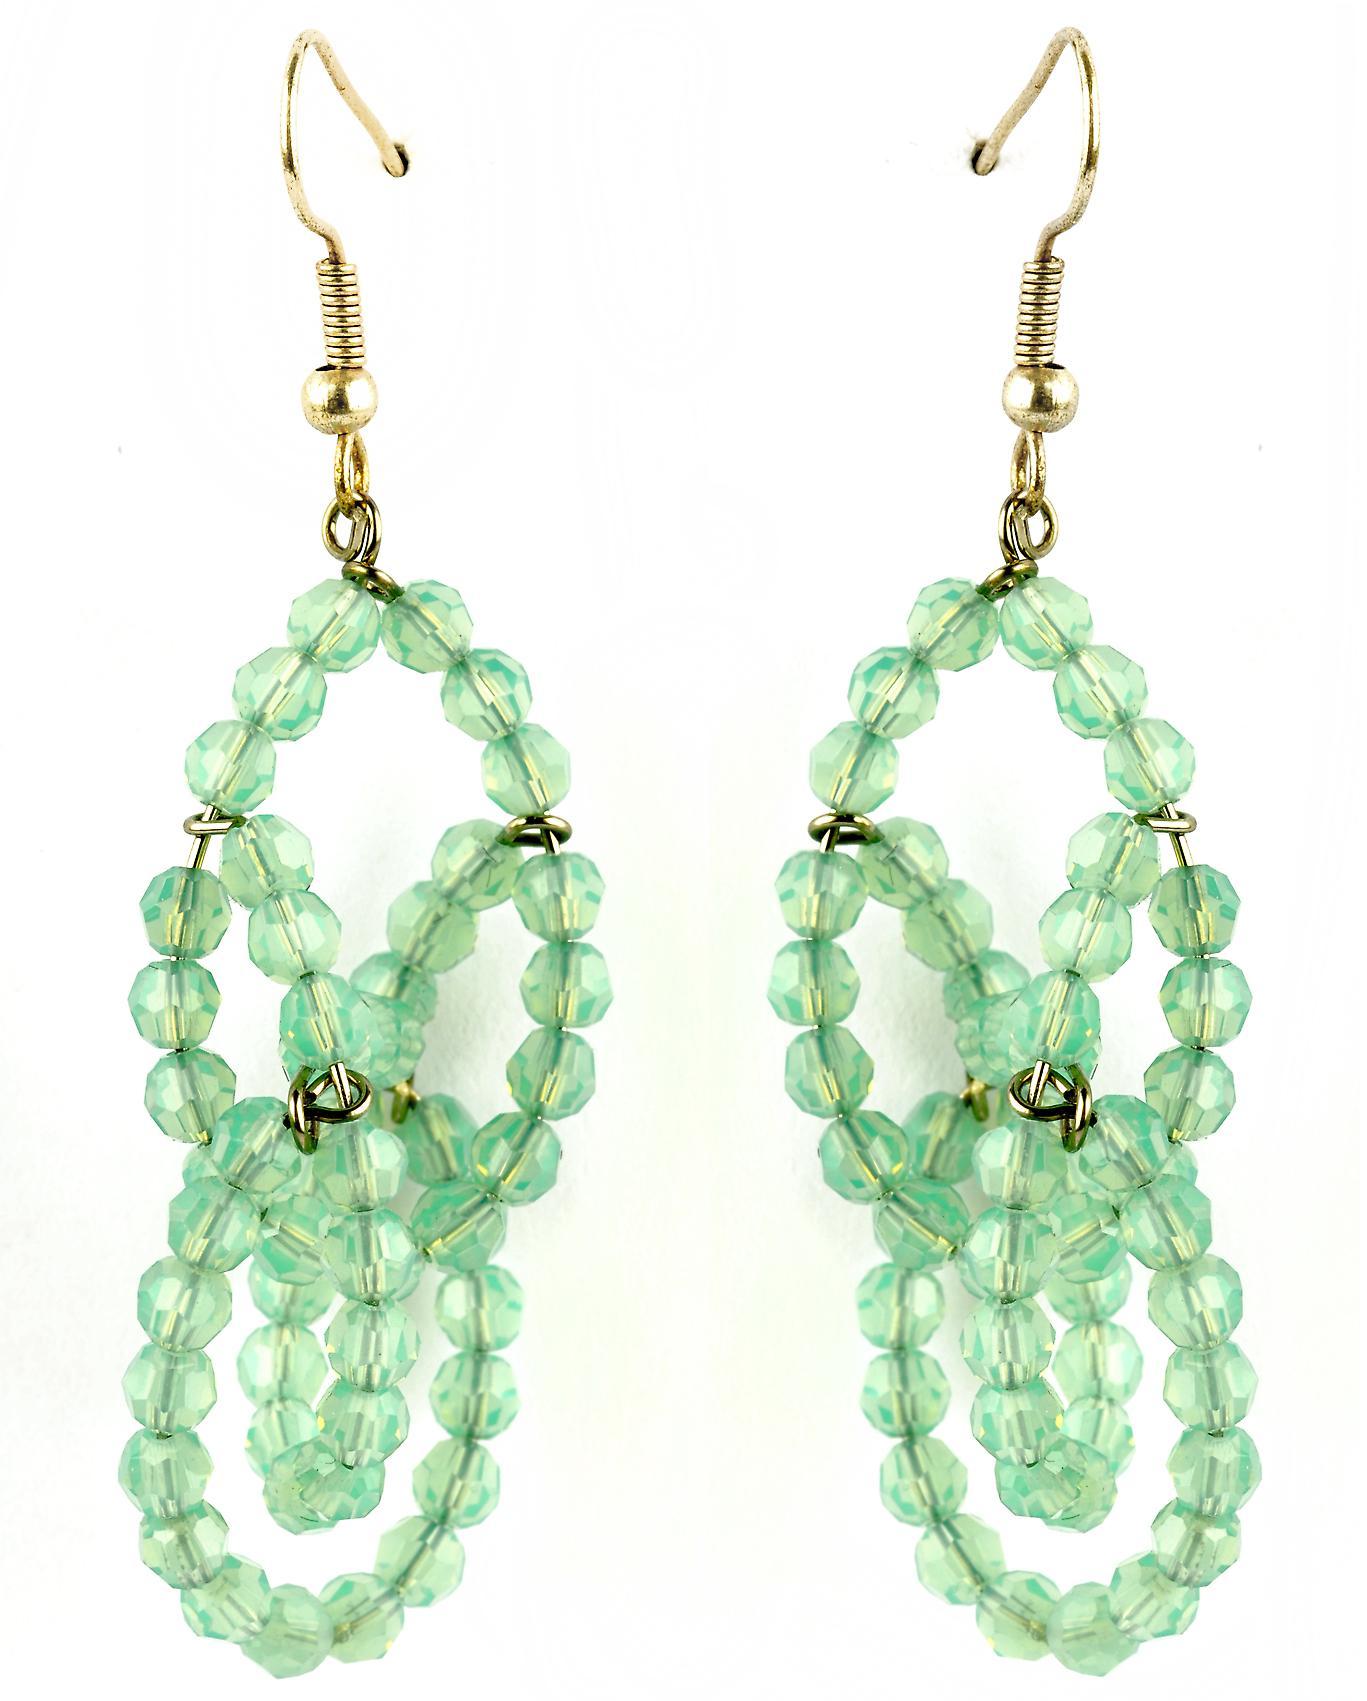 Waooh - sieraden - WJ0744 - oorbellen met strass Swarovski groen transparant